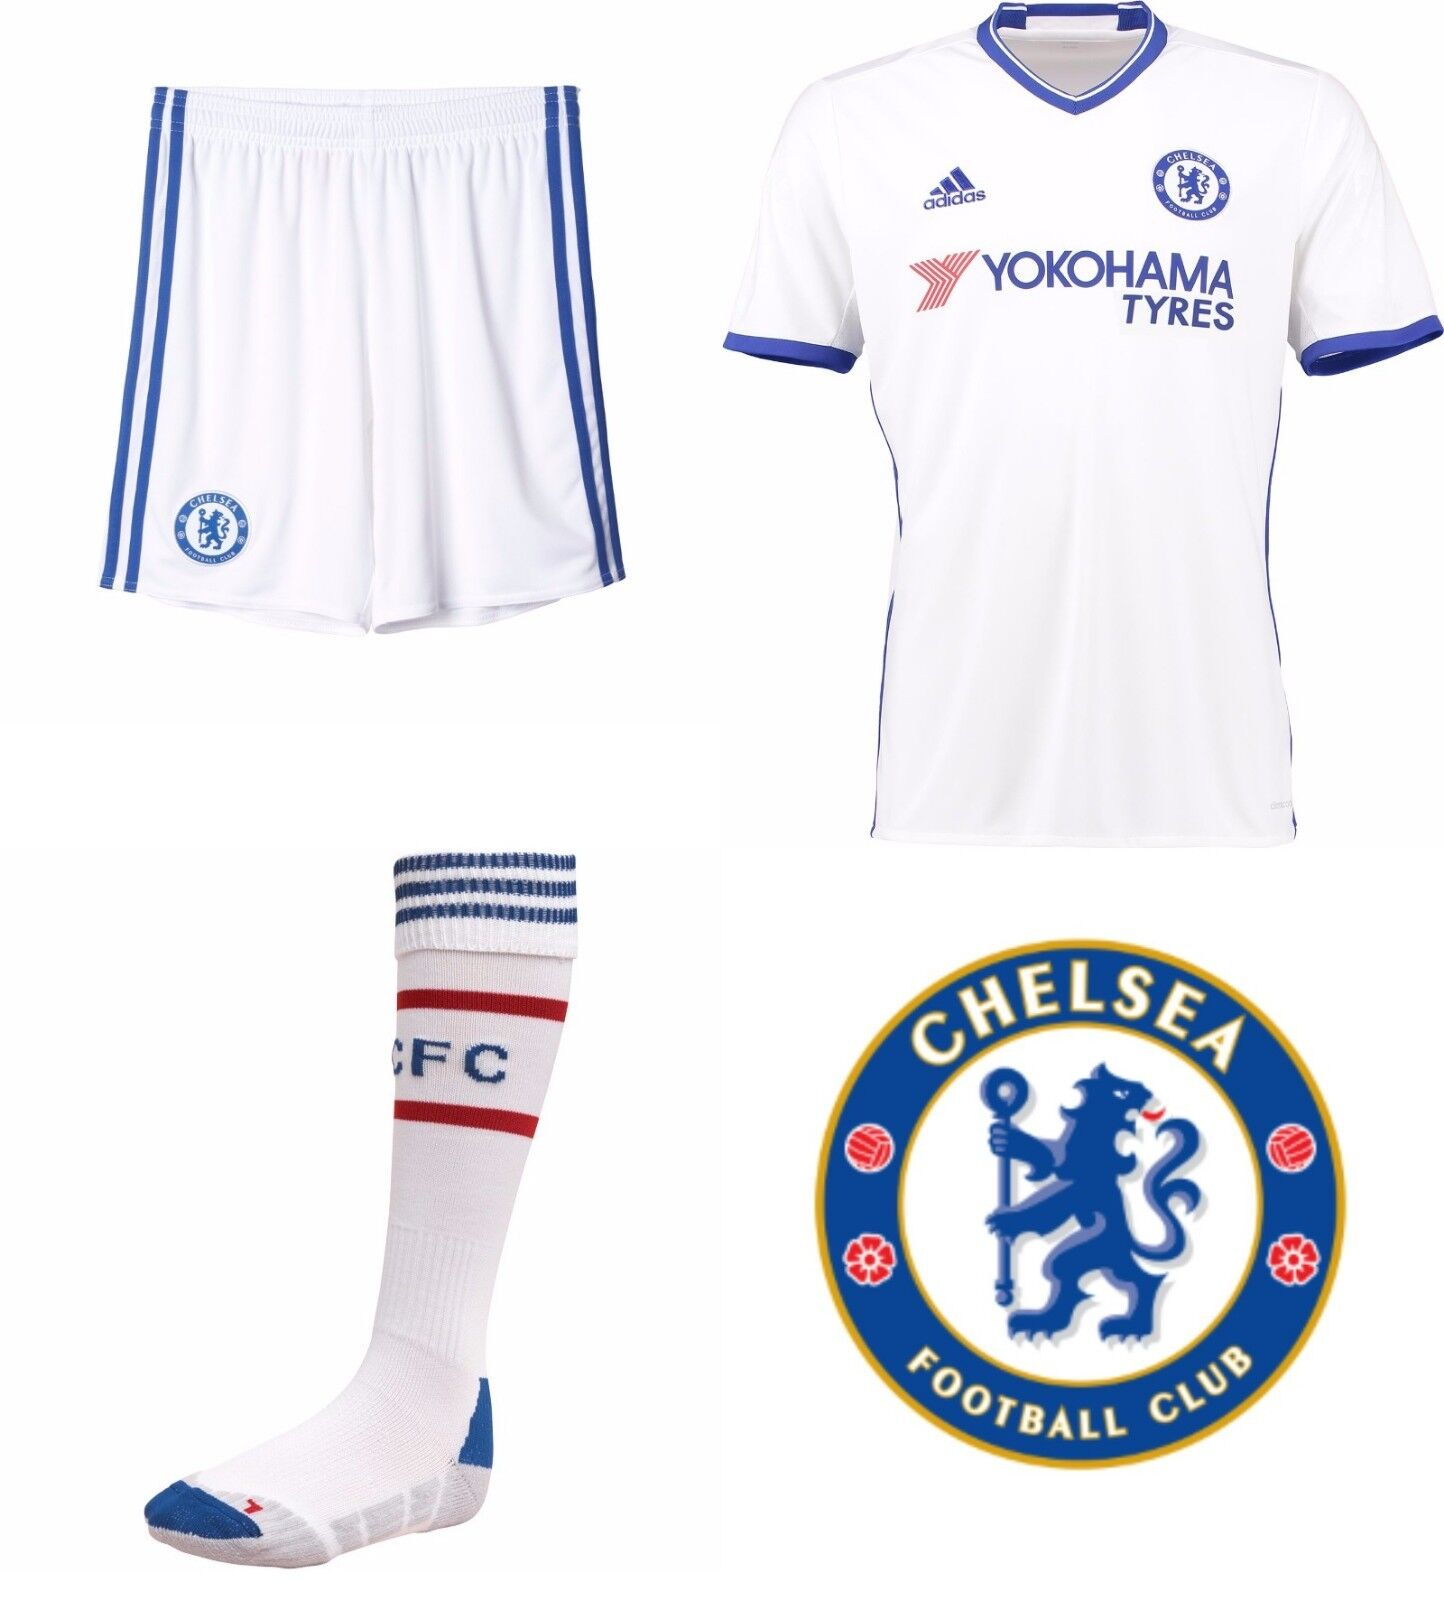 Chelsea 3. Set Hemd Shorts & Socken 2016 17 Jahreszeiten Kinder Offiziell Adidas